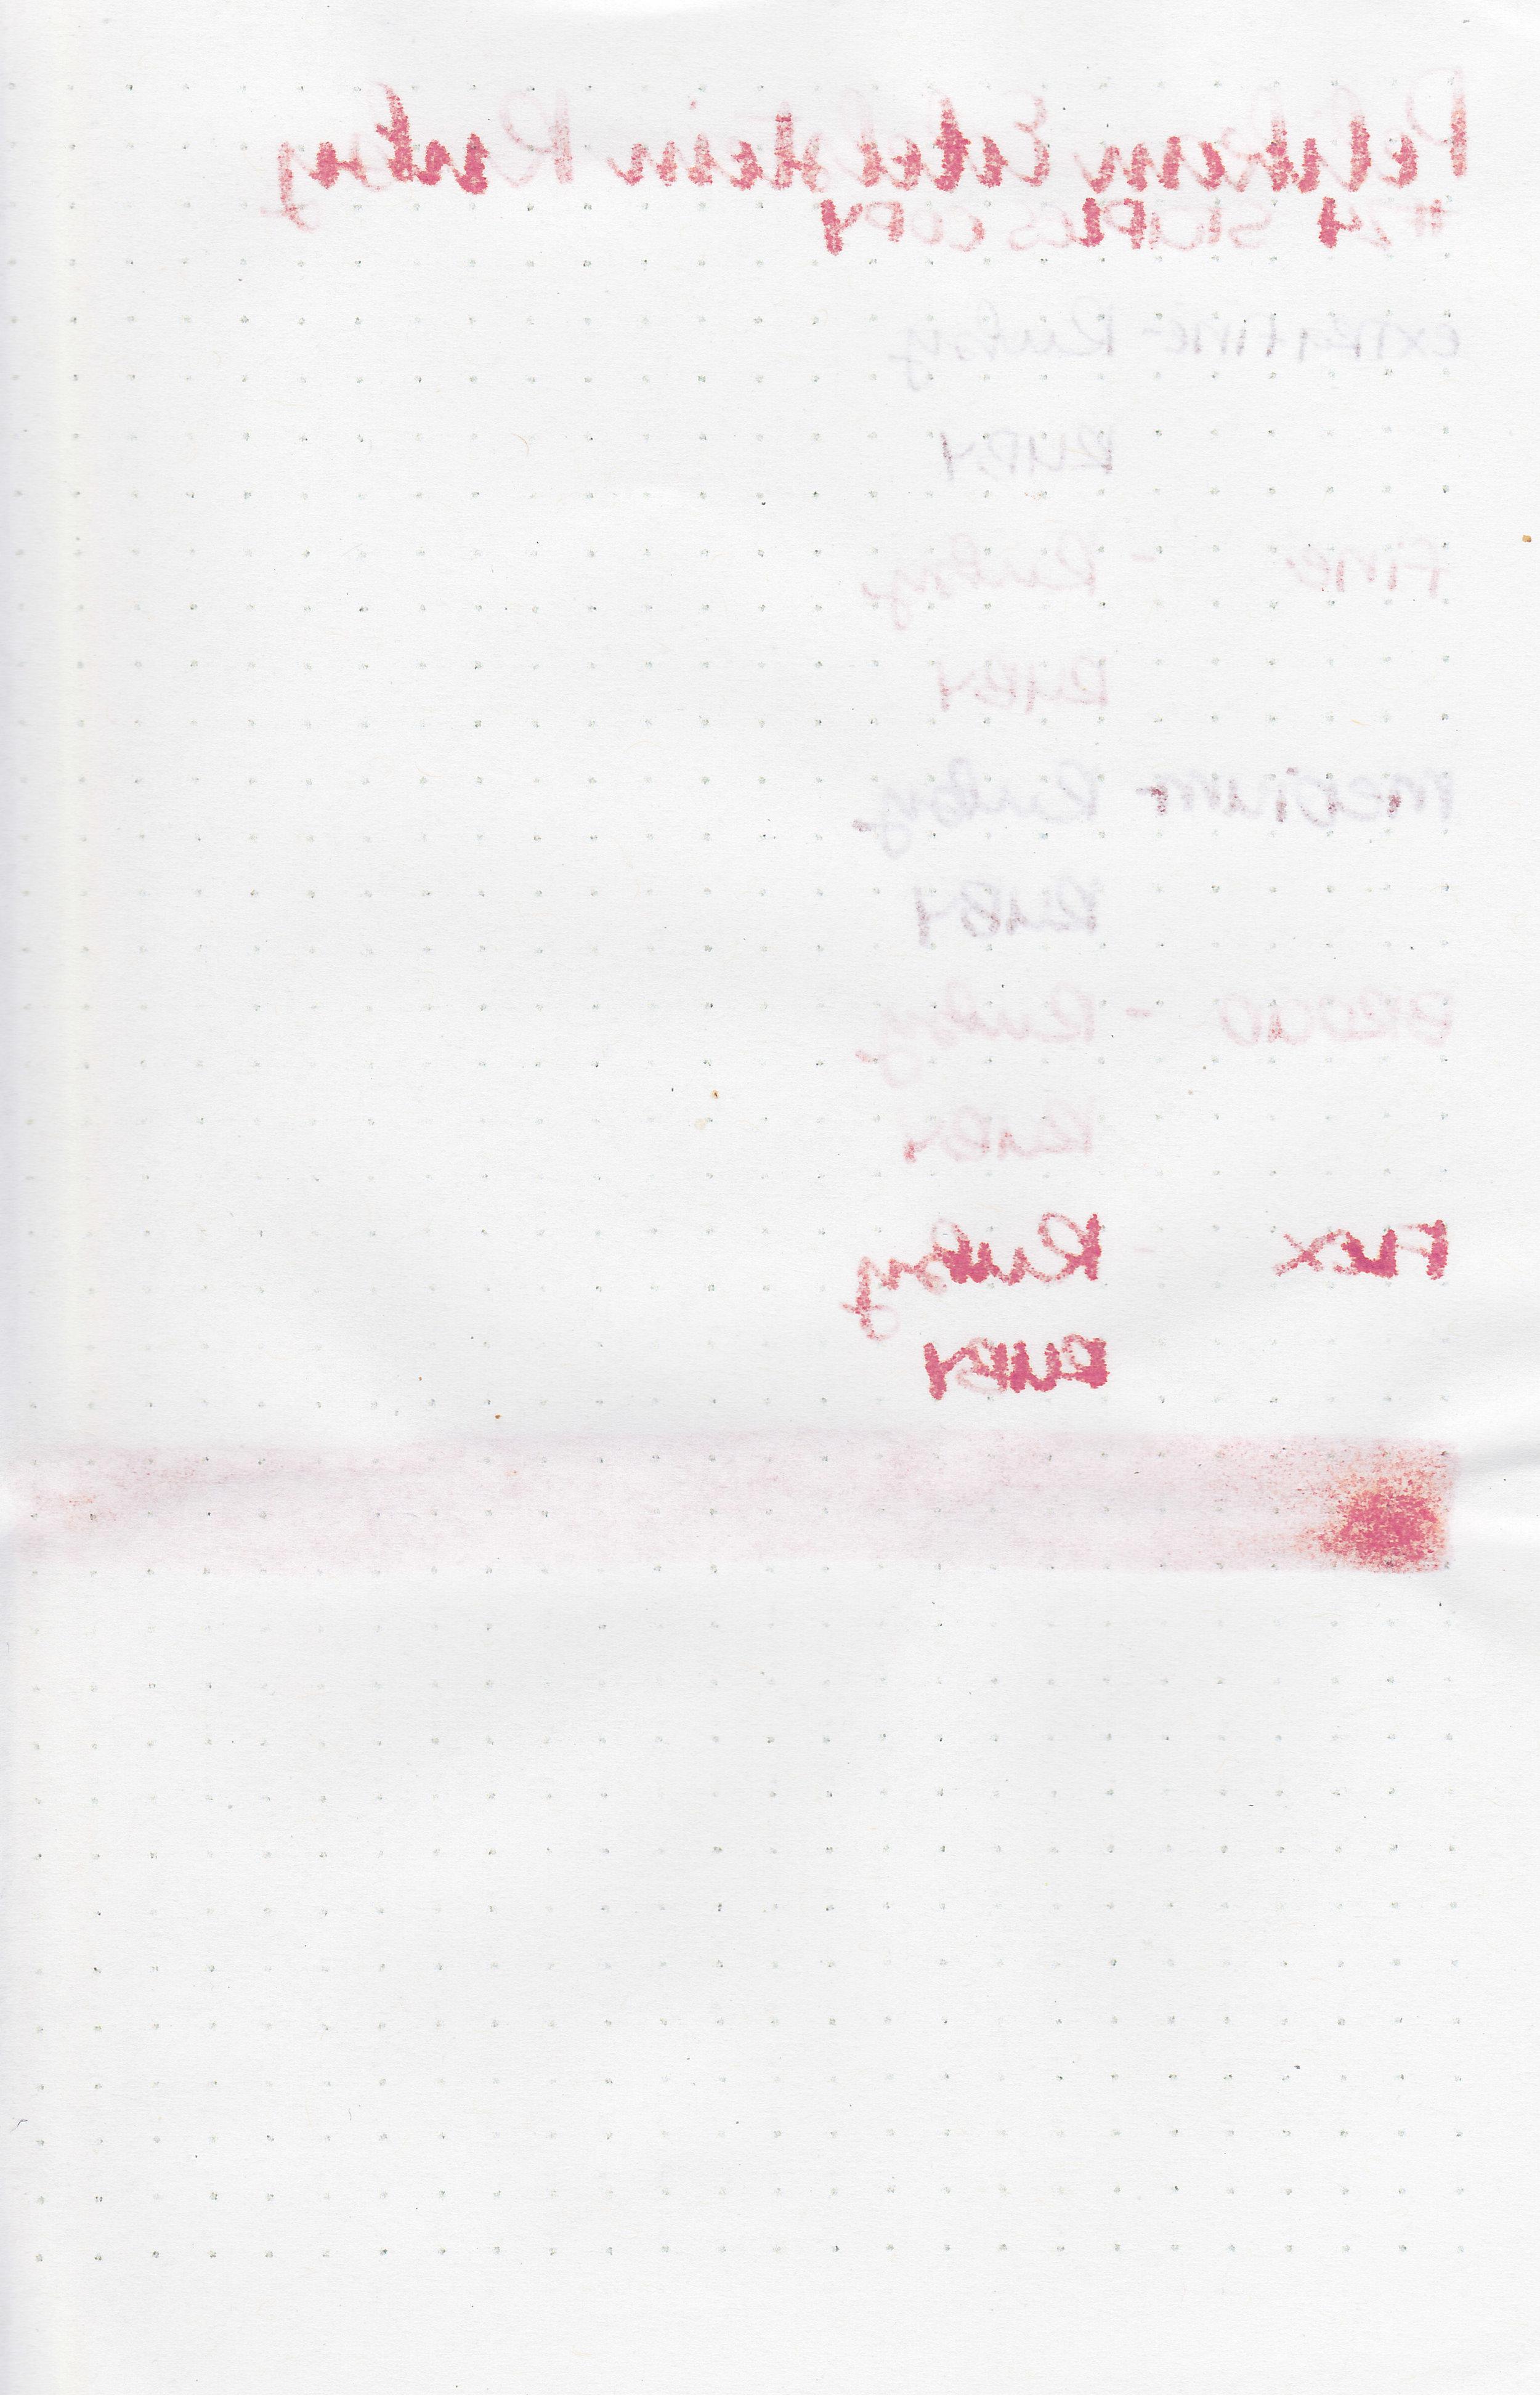 pe-ruby-12.jpg